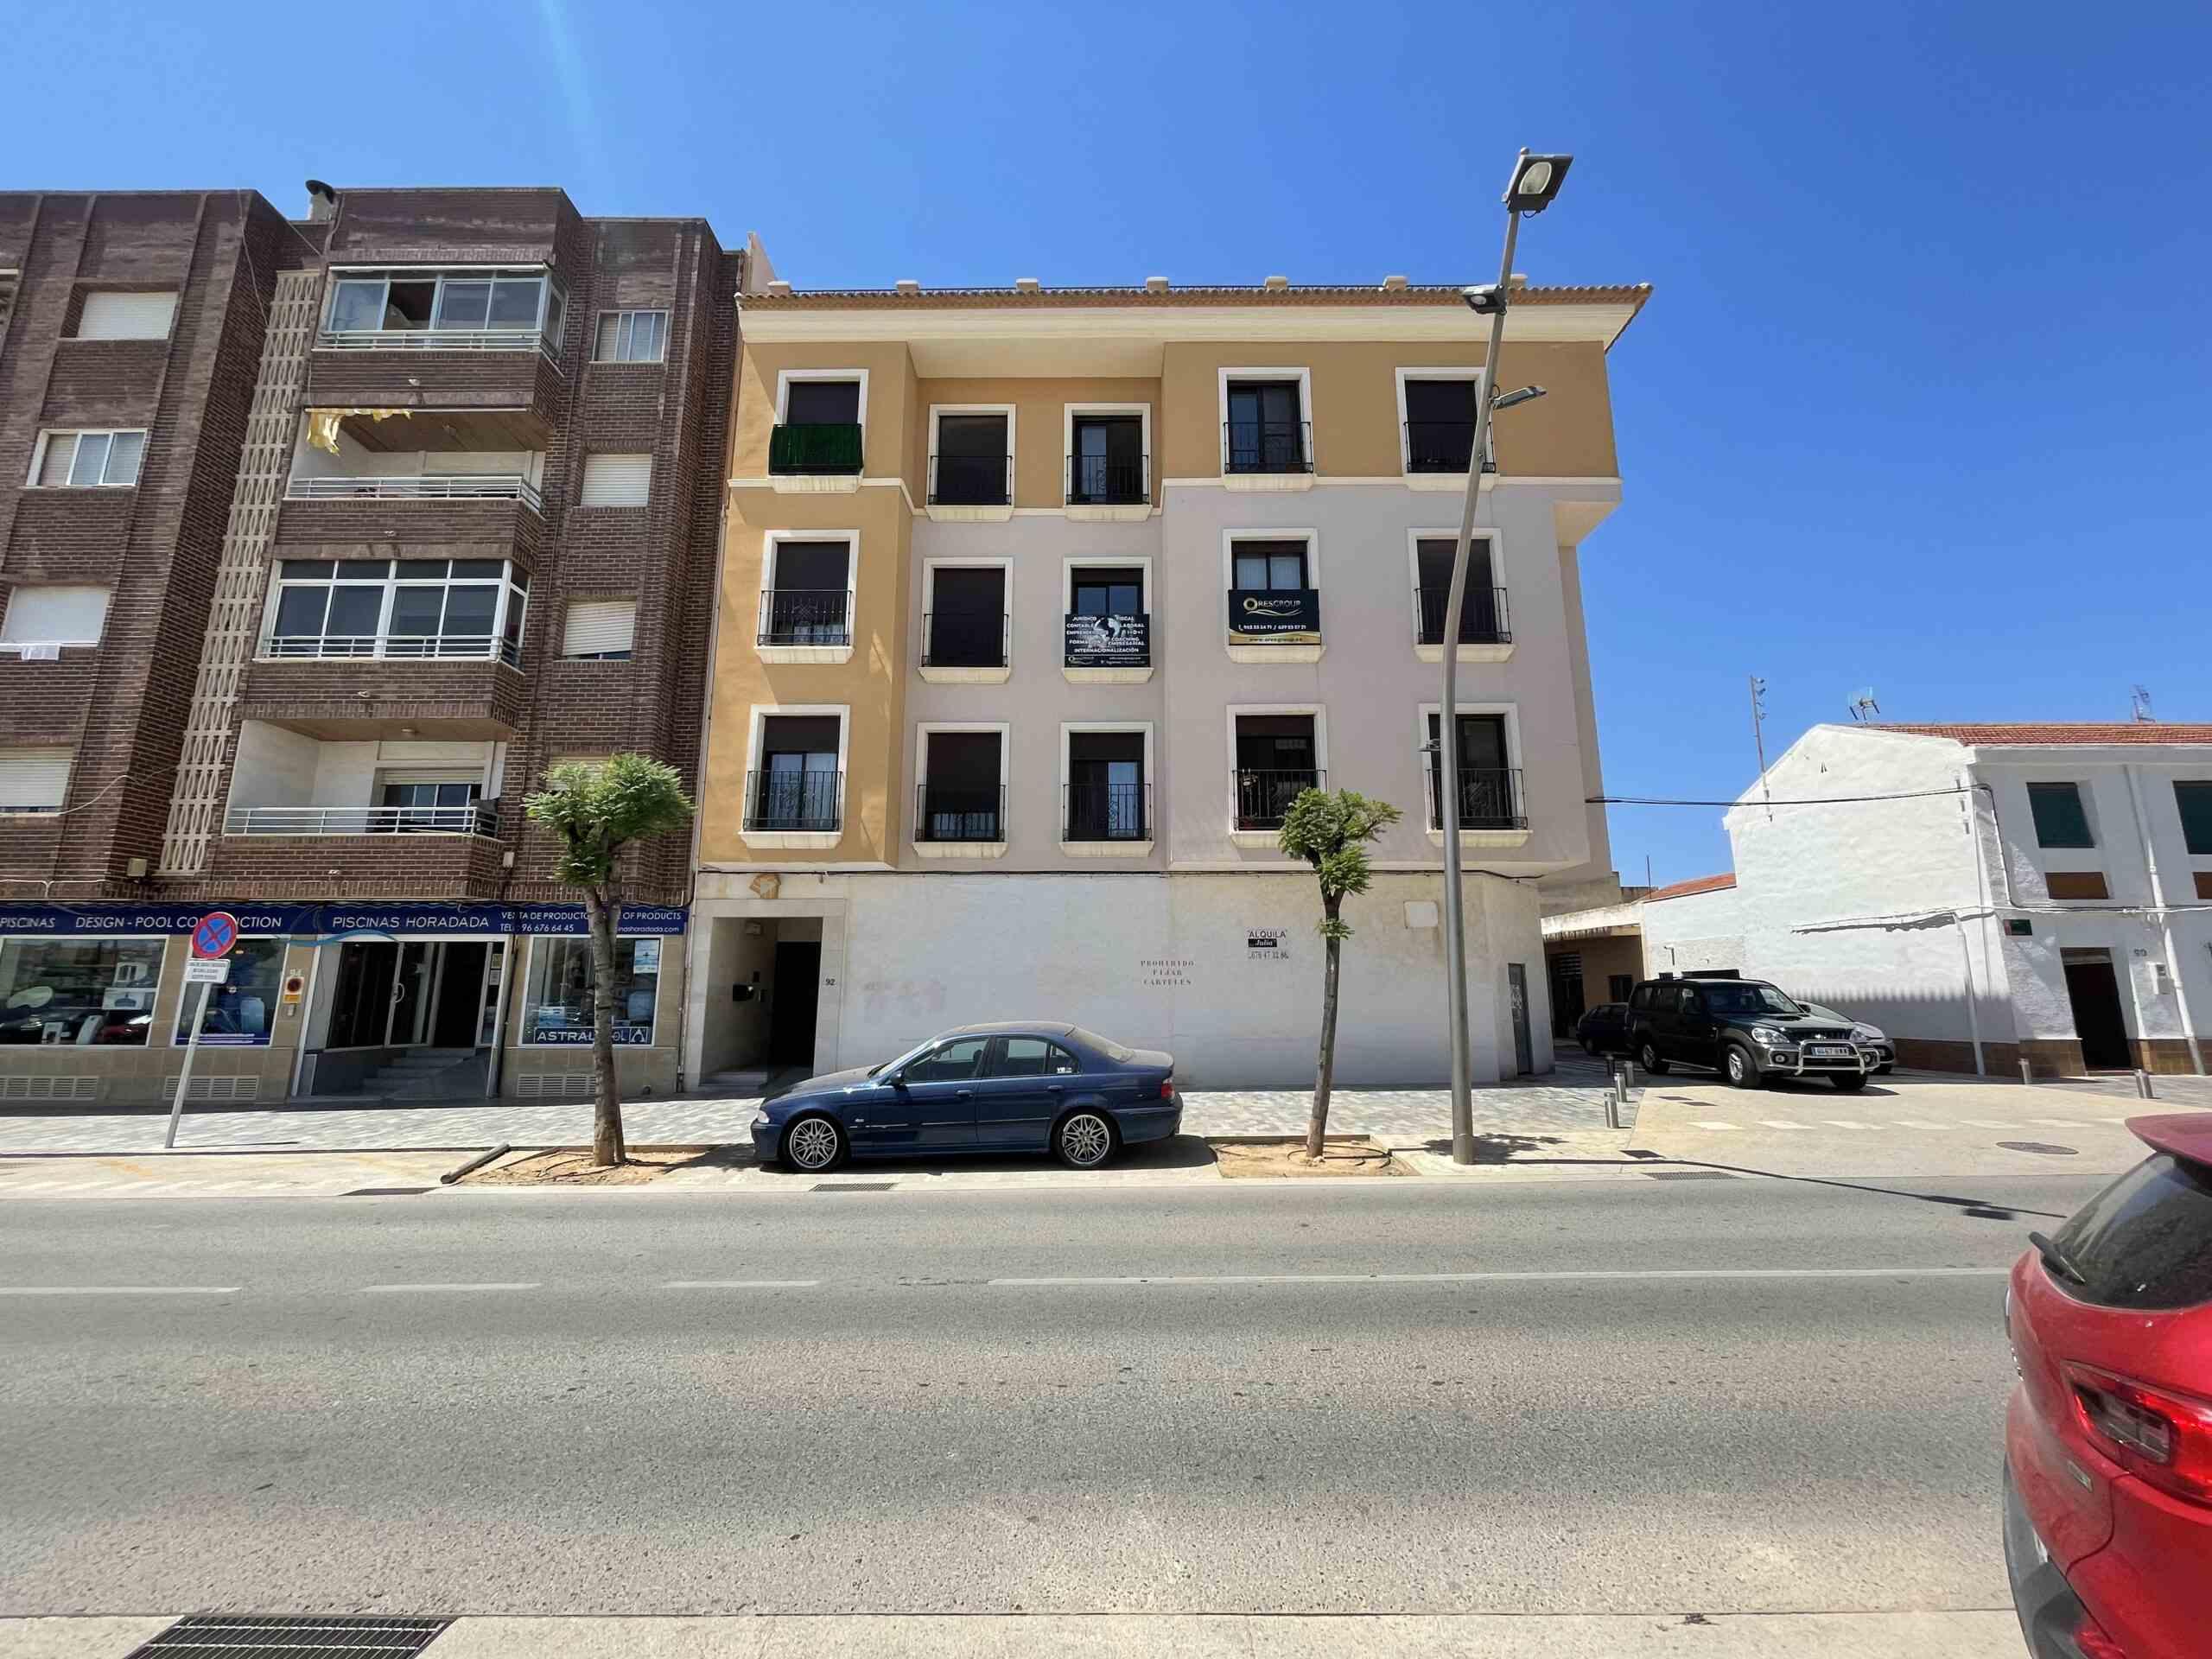 3 bedroom apartment / flat for sale in Pilar de la Horadada, Costa Blanca